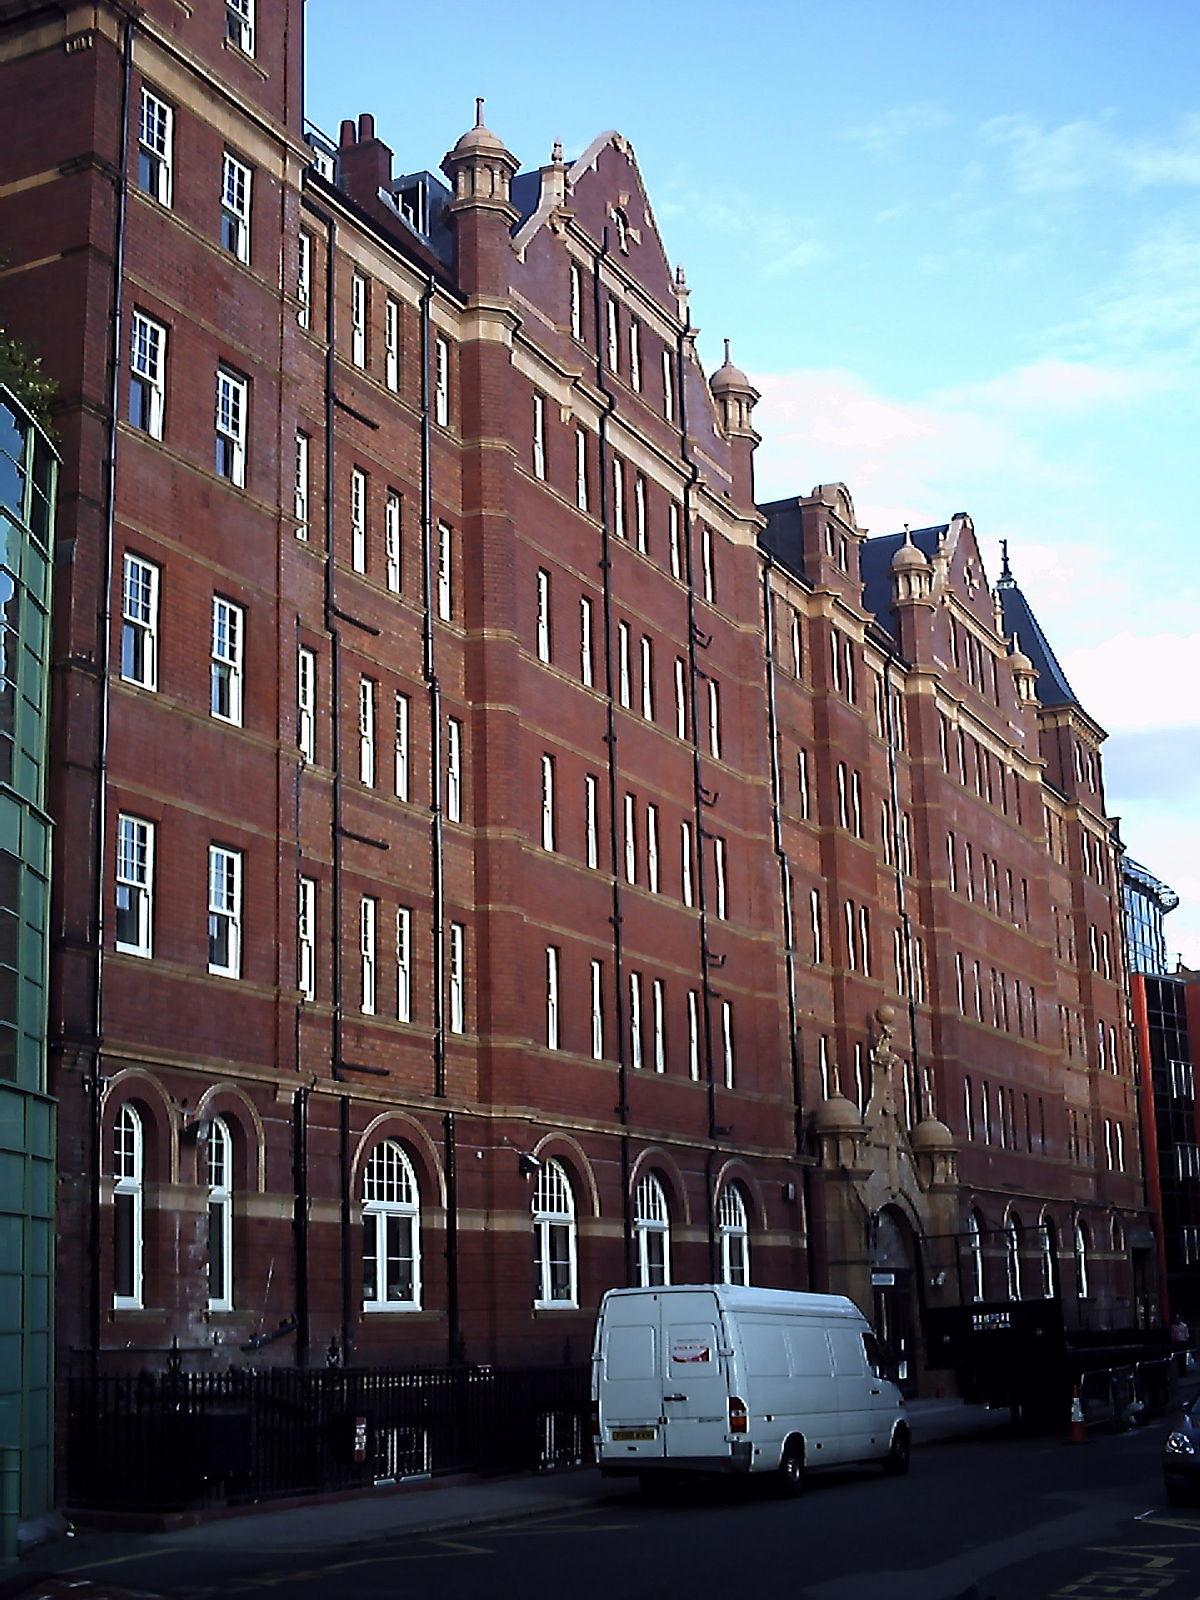 Arlington house london wikipedia for Camden home